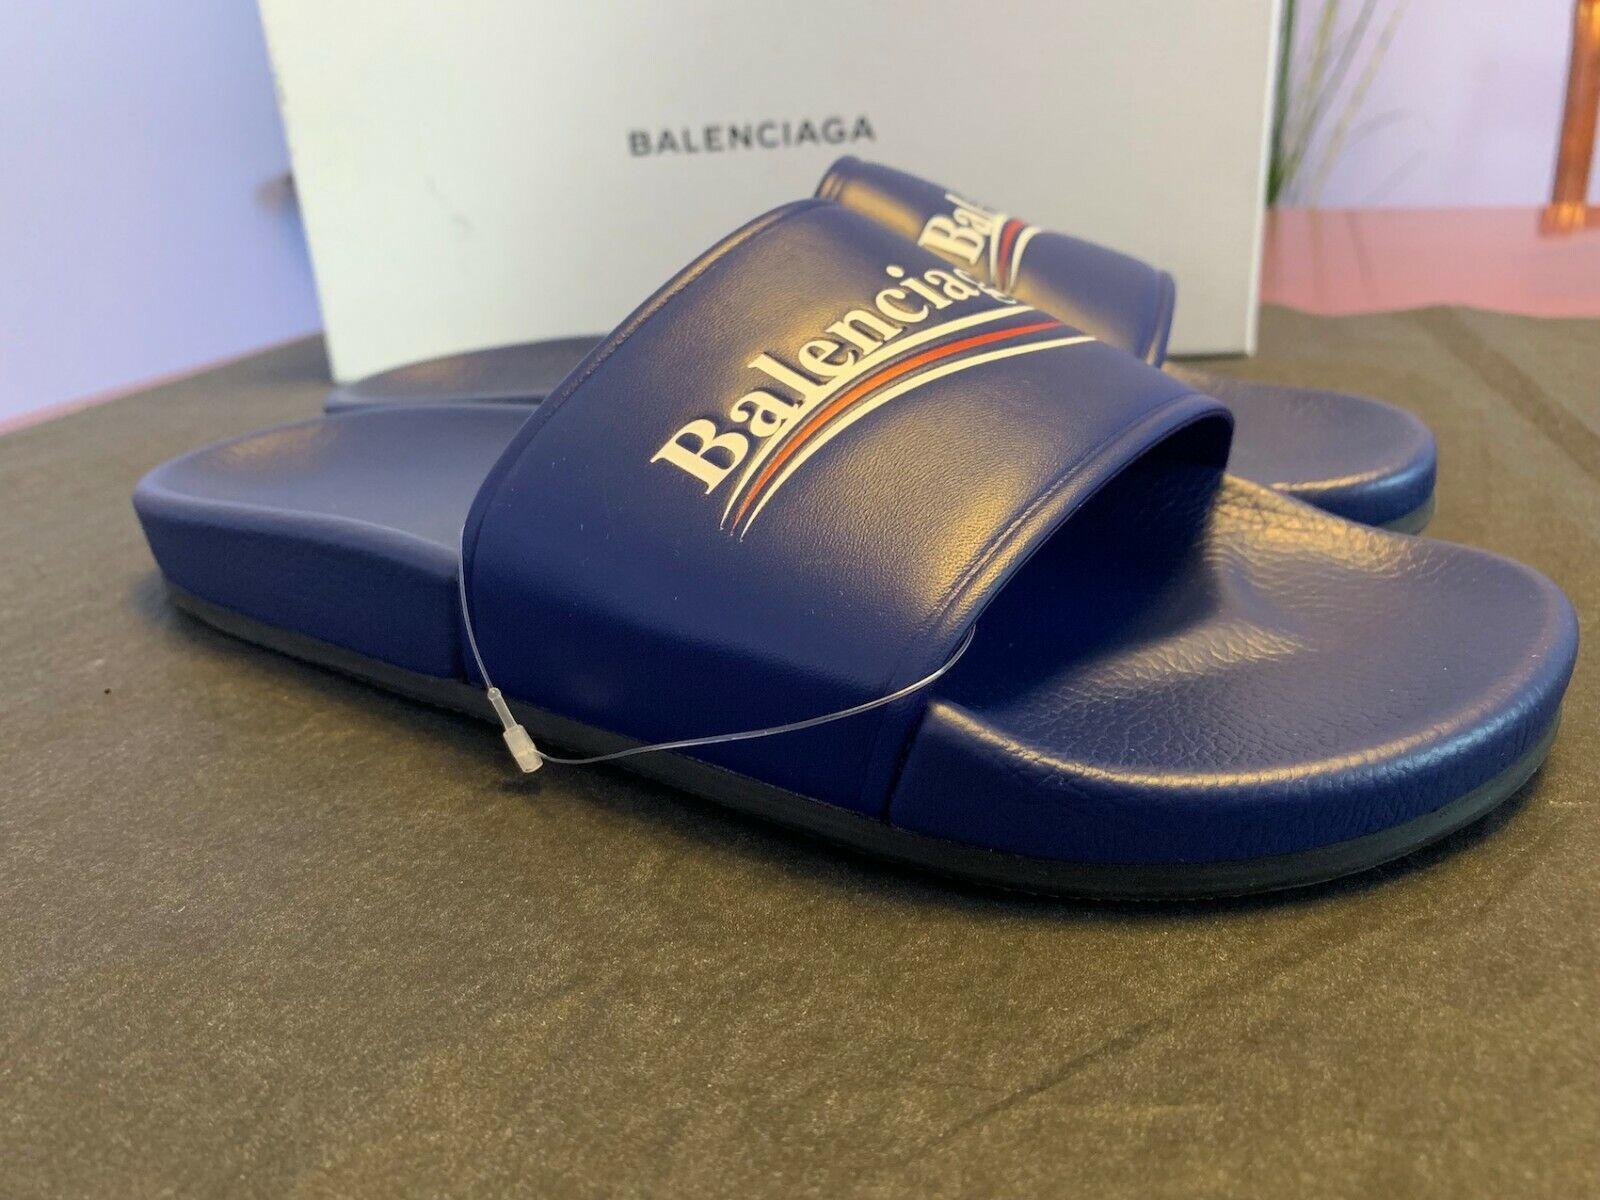 NIB Balenciaga Logo Campaign Flat Pool Slide Sandal, US9